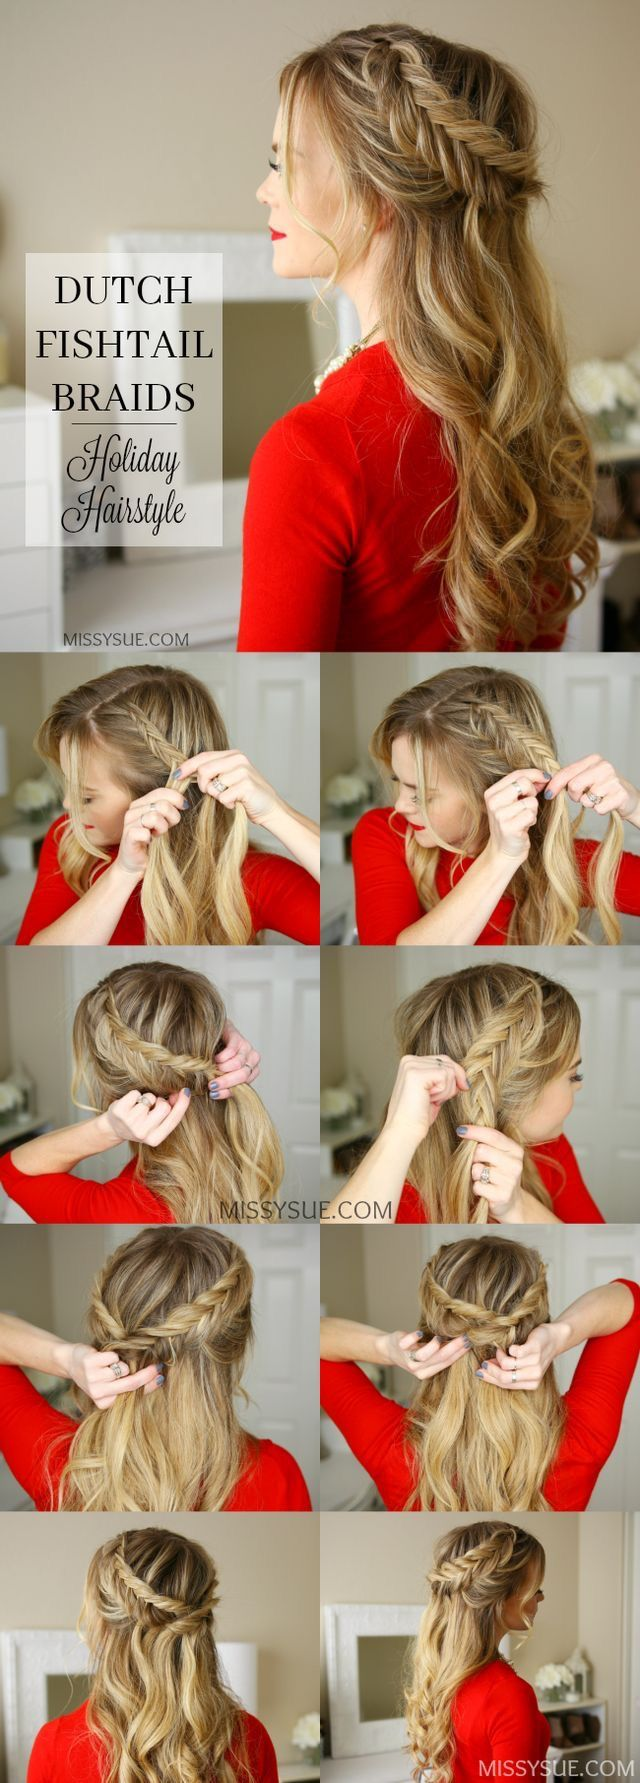 Pin by jayce cruz on hair pinterest hair style hair makeup and